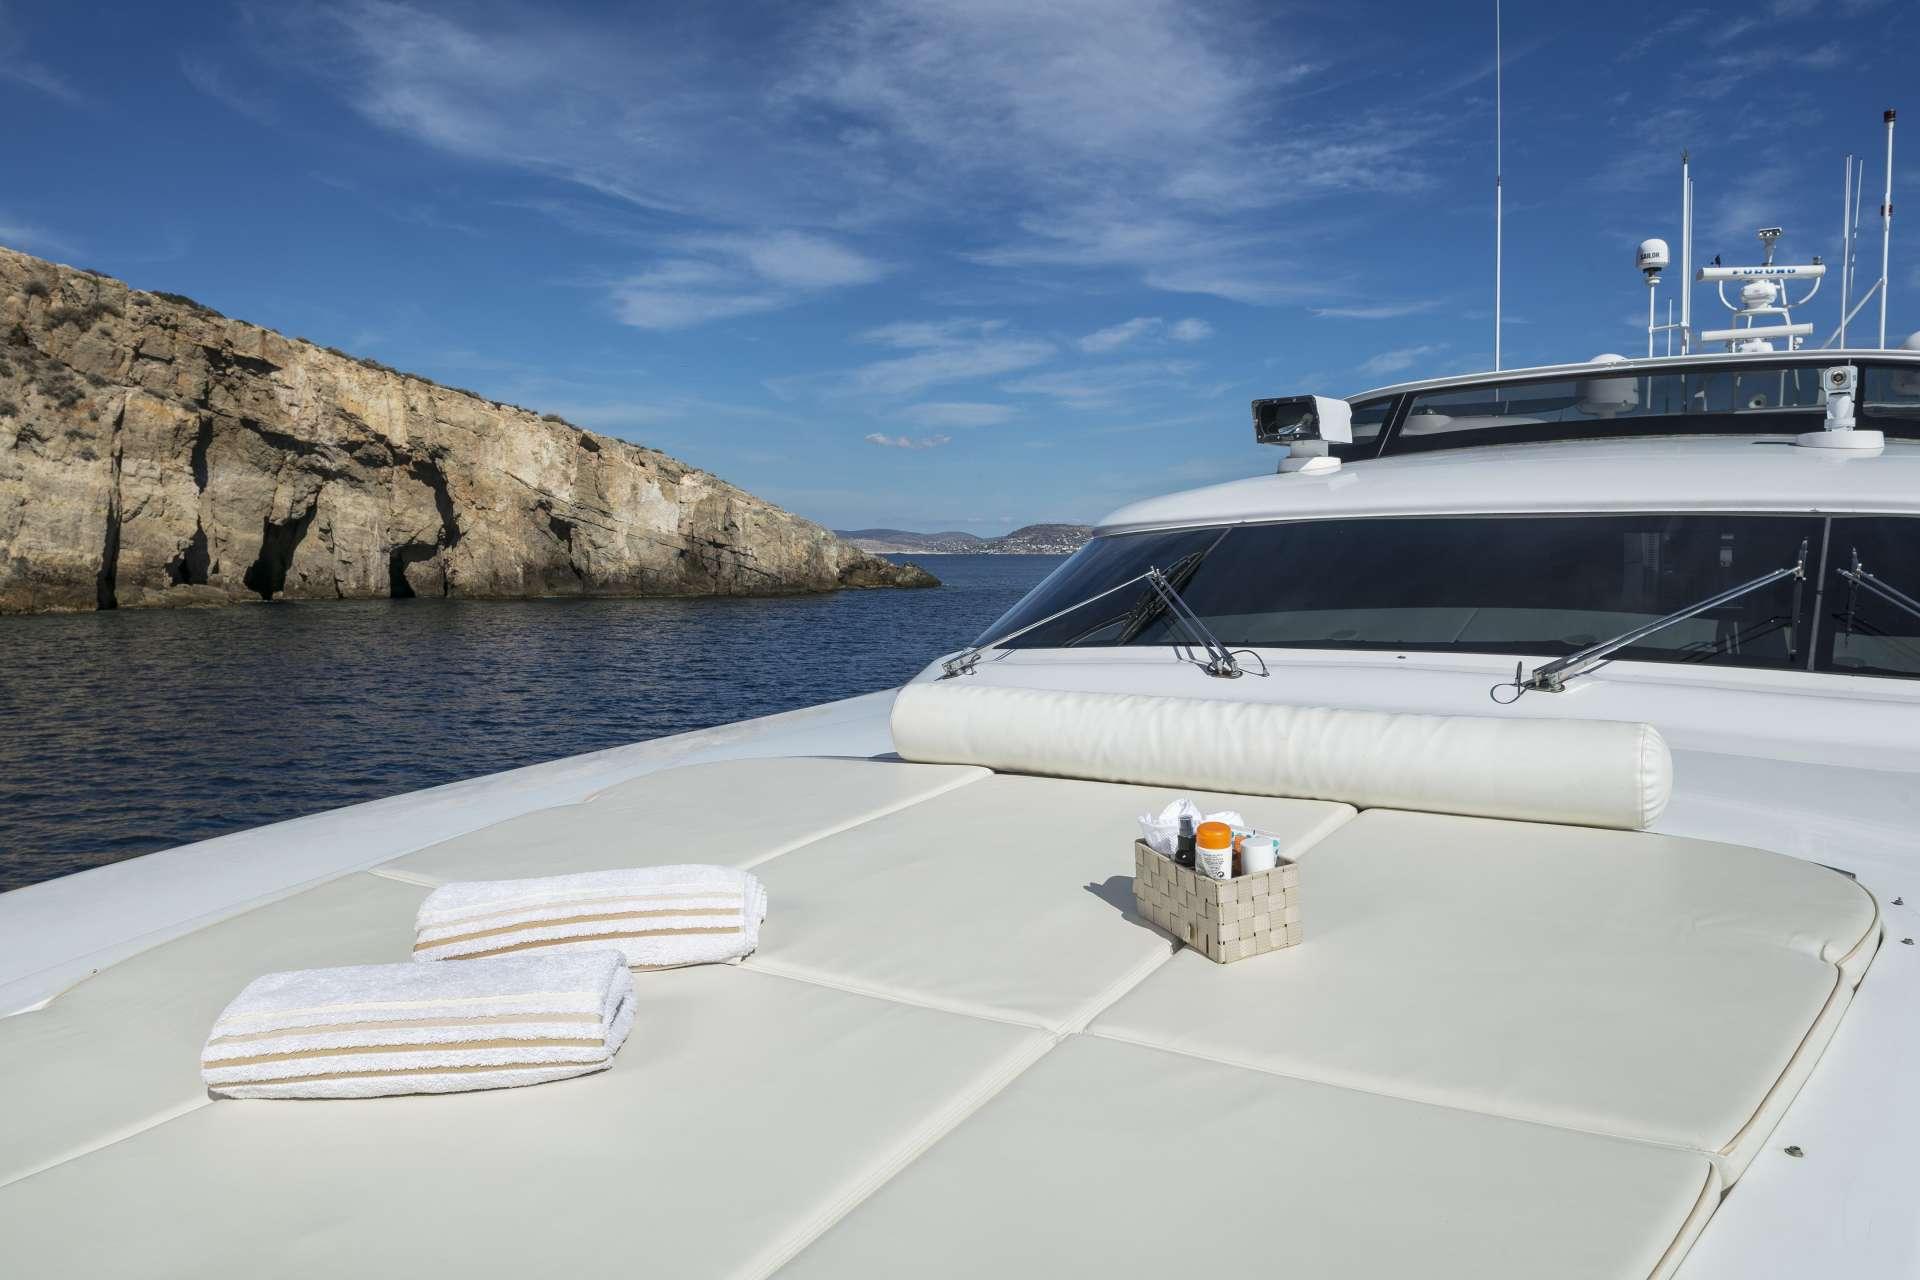 Motor Yacht 'PARIS A' Bow area, 12 PAX, 6 Crew, 115.00 Ft, 35.06 Meters, Built 2009, Majora, Refit Year 2013